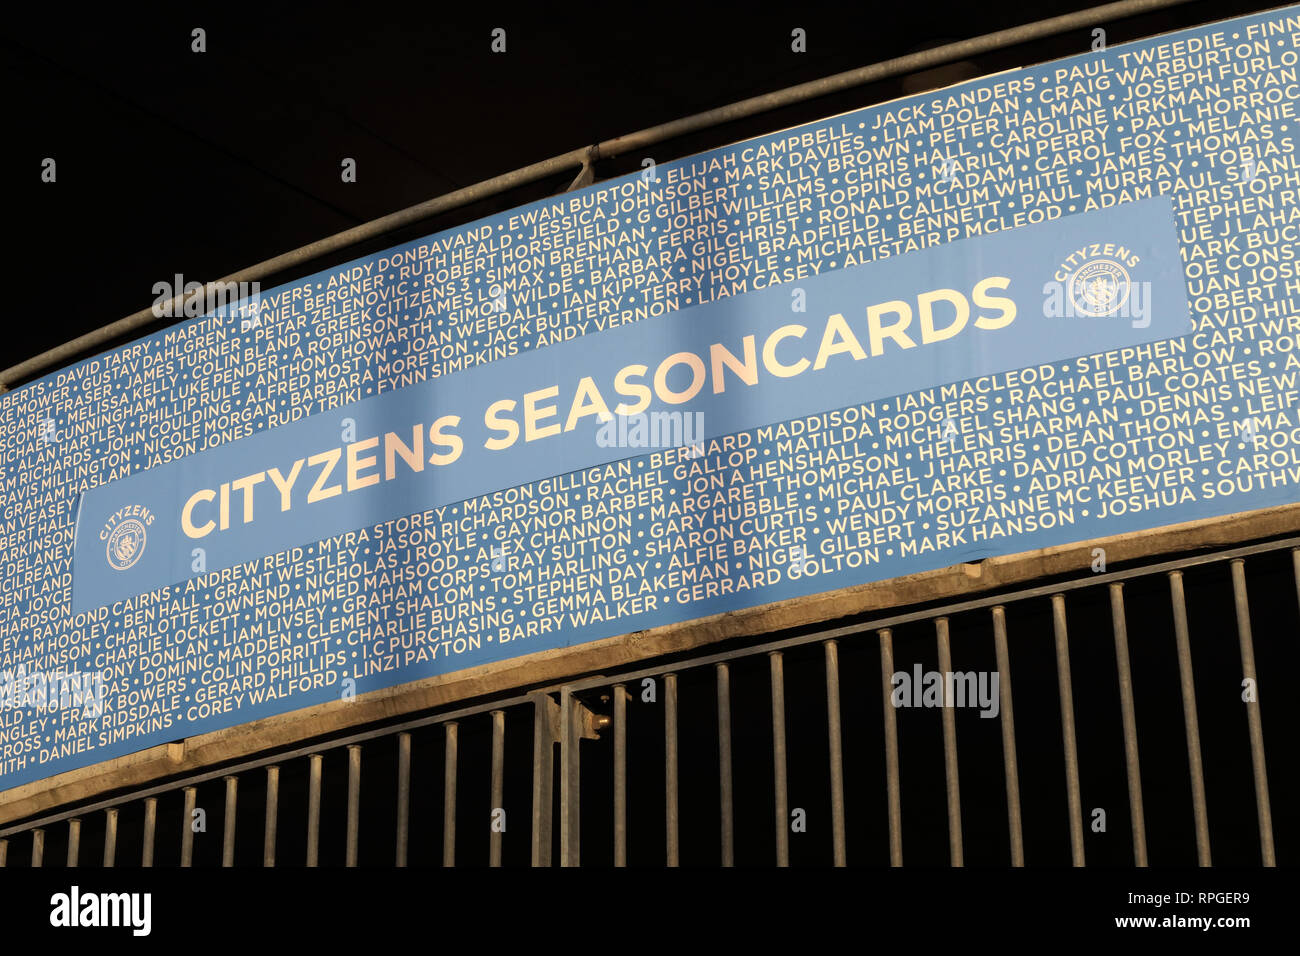 MCFC Manchester City, Etihad Stadium, Cityzens, Seasoncards, Season Ticket Cards, Football Club - Stock Image